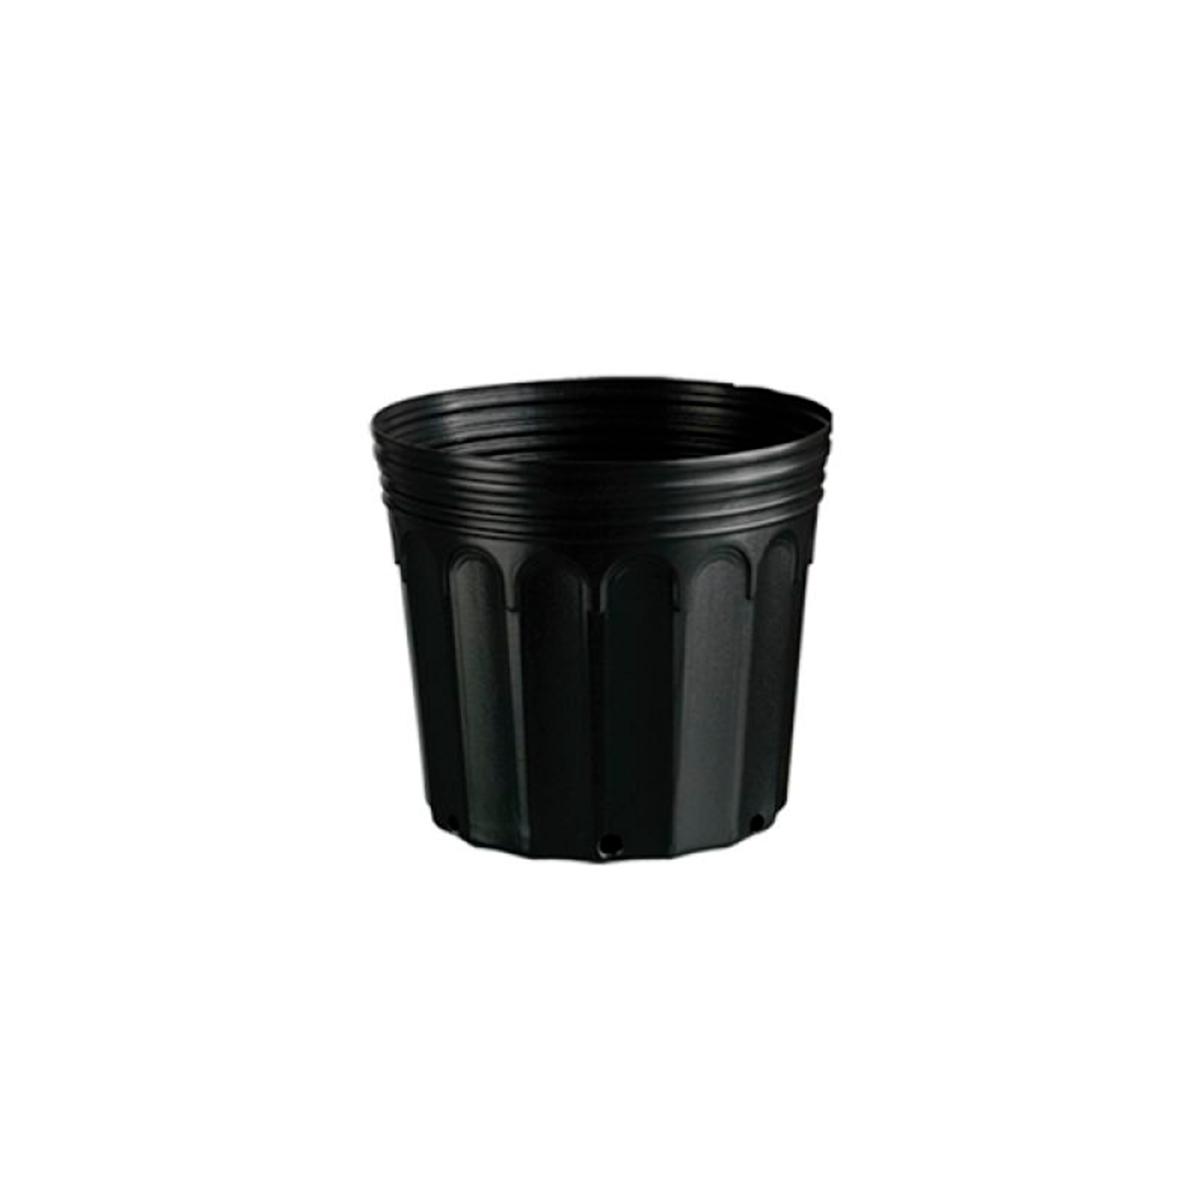 Kit 200 Embalagem para Mudas Flexível Plástico 8,5L